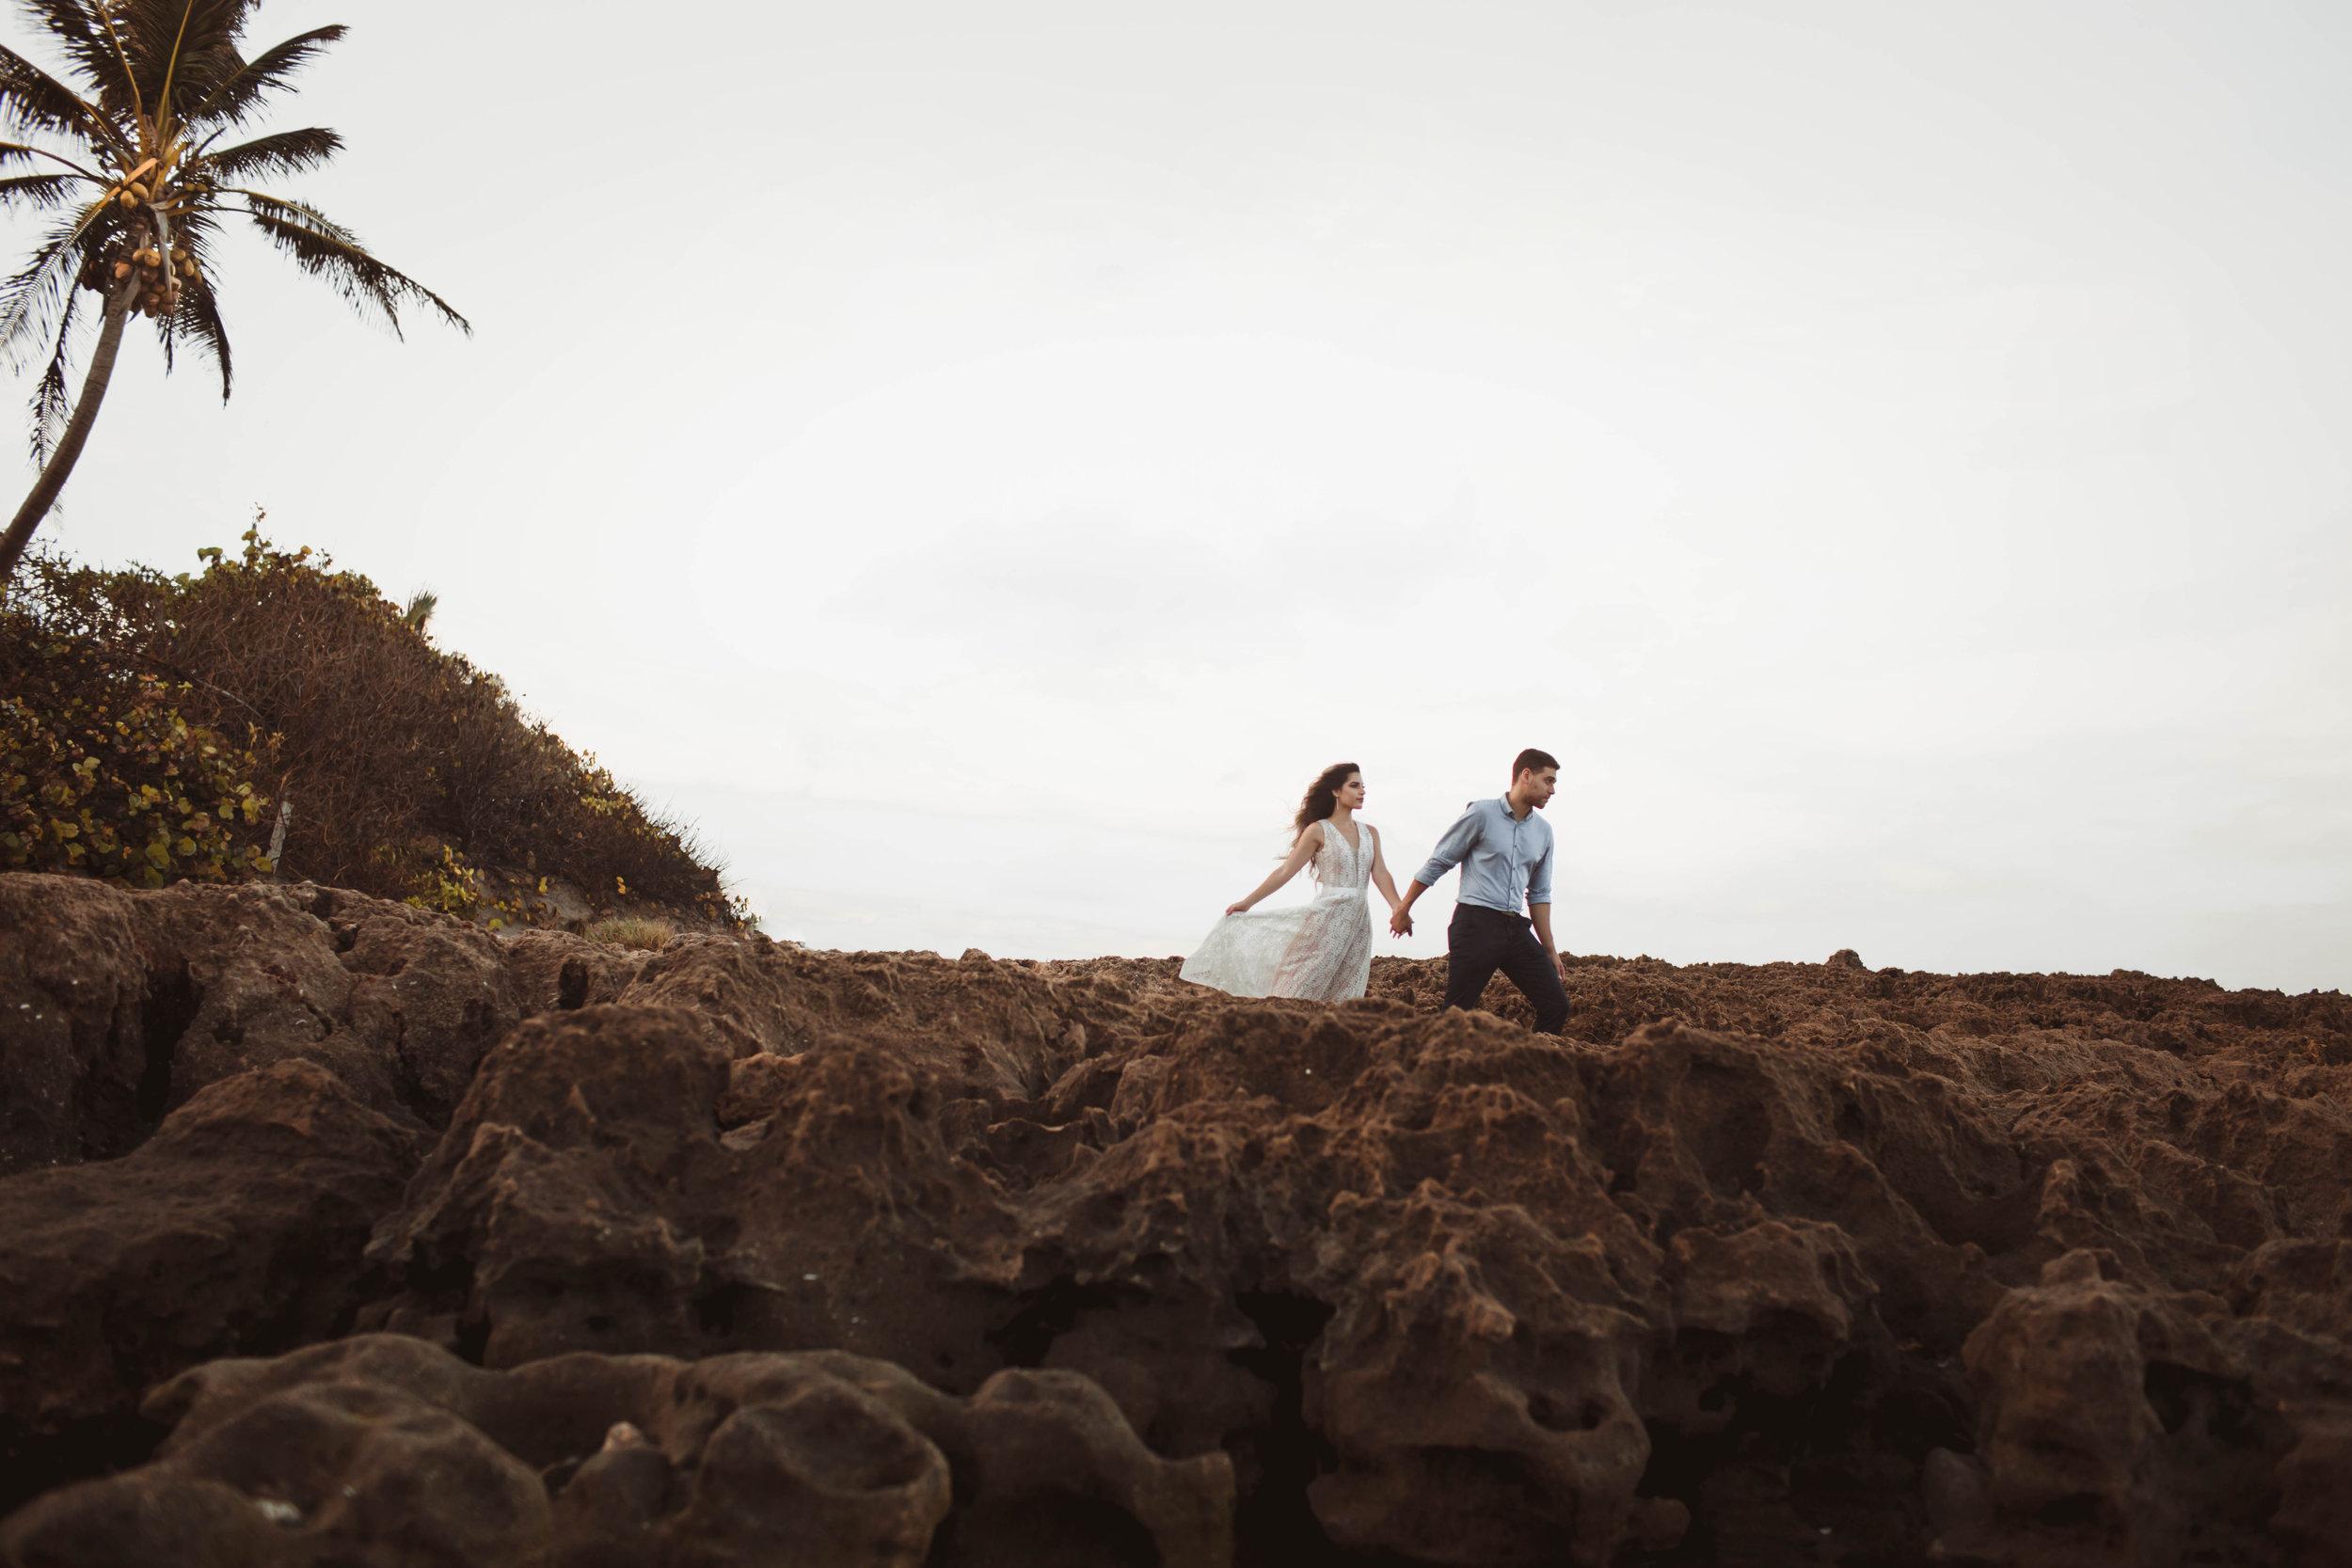 Engagement Session | Kiara Marie and Calixto |  © Vanessa Boy | vanessaboy.com-236.jpg